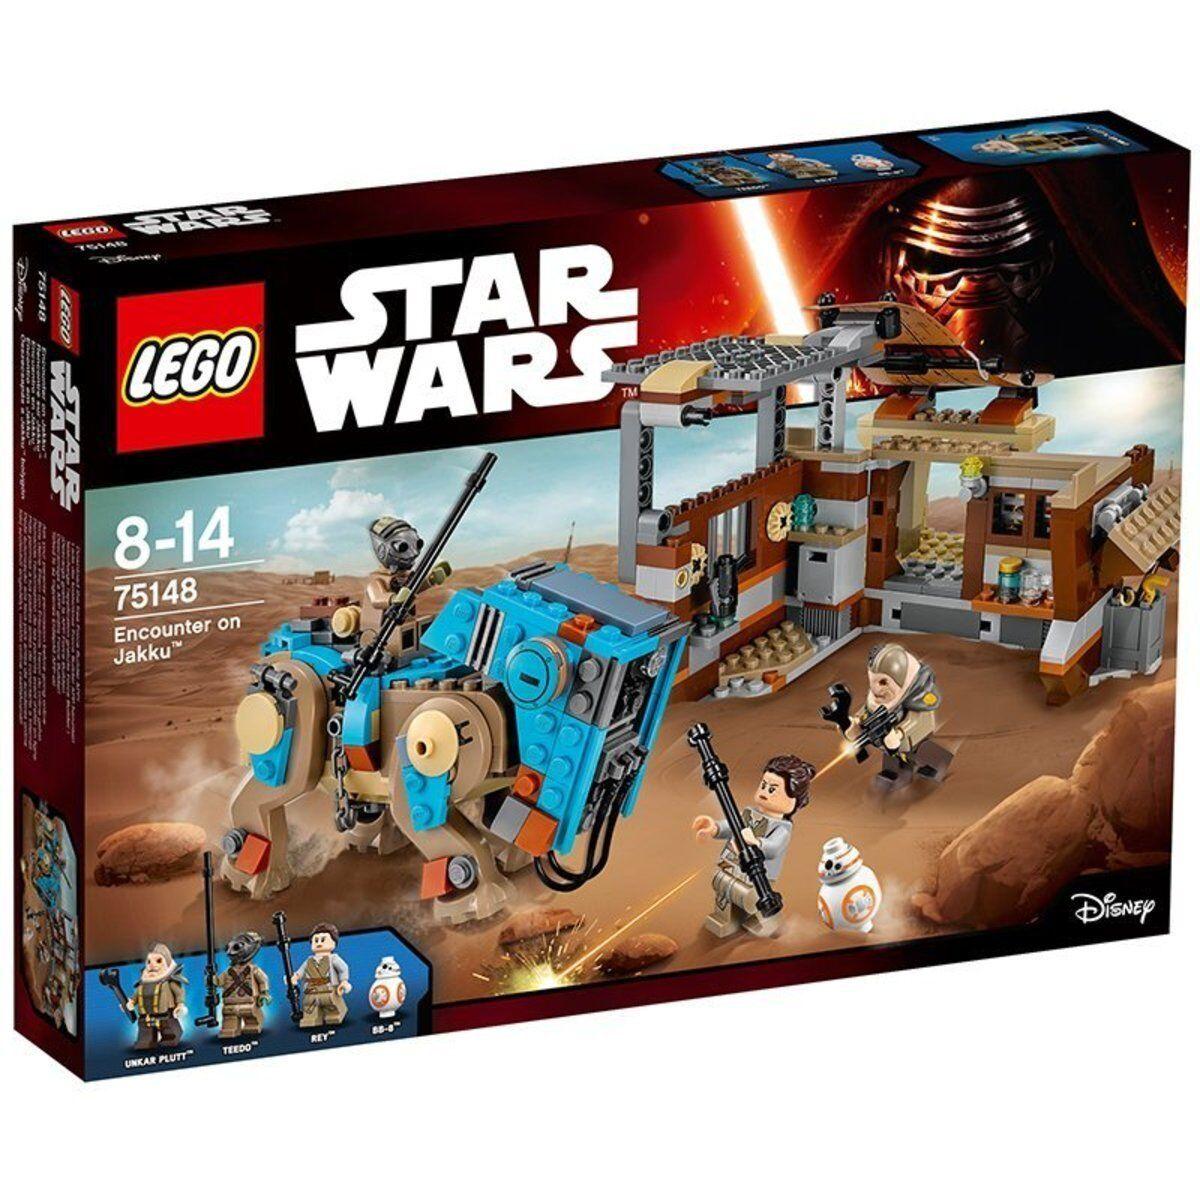 Lego Star Wars 75148 Encounter On Jakku Incontro su 100% Neuf Scatola Sigillato